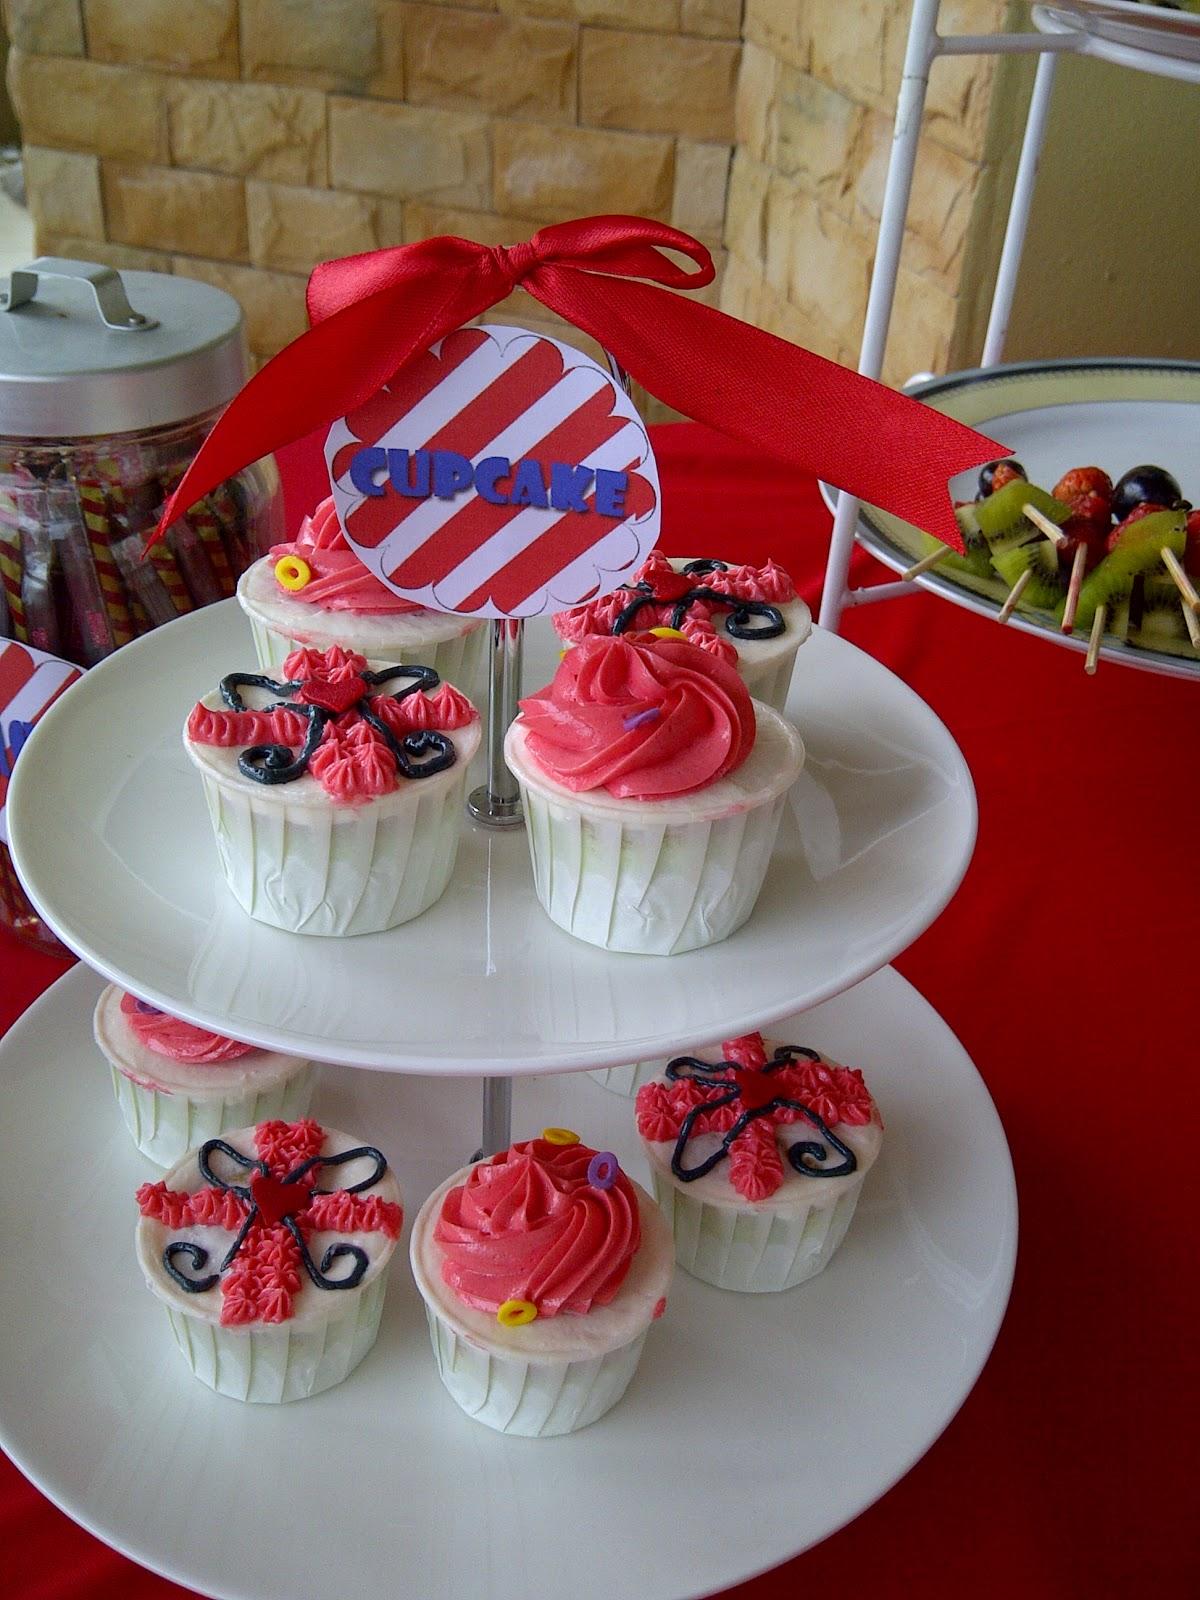 Birthday Cake Icing Decorations Image Inspiration of Cake and